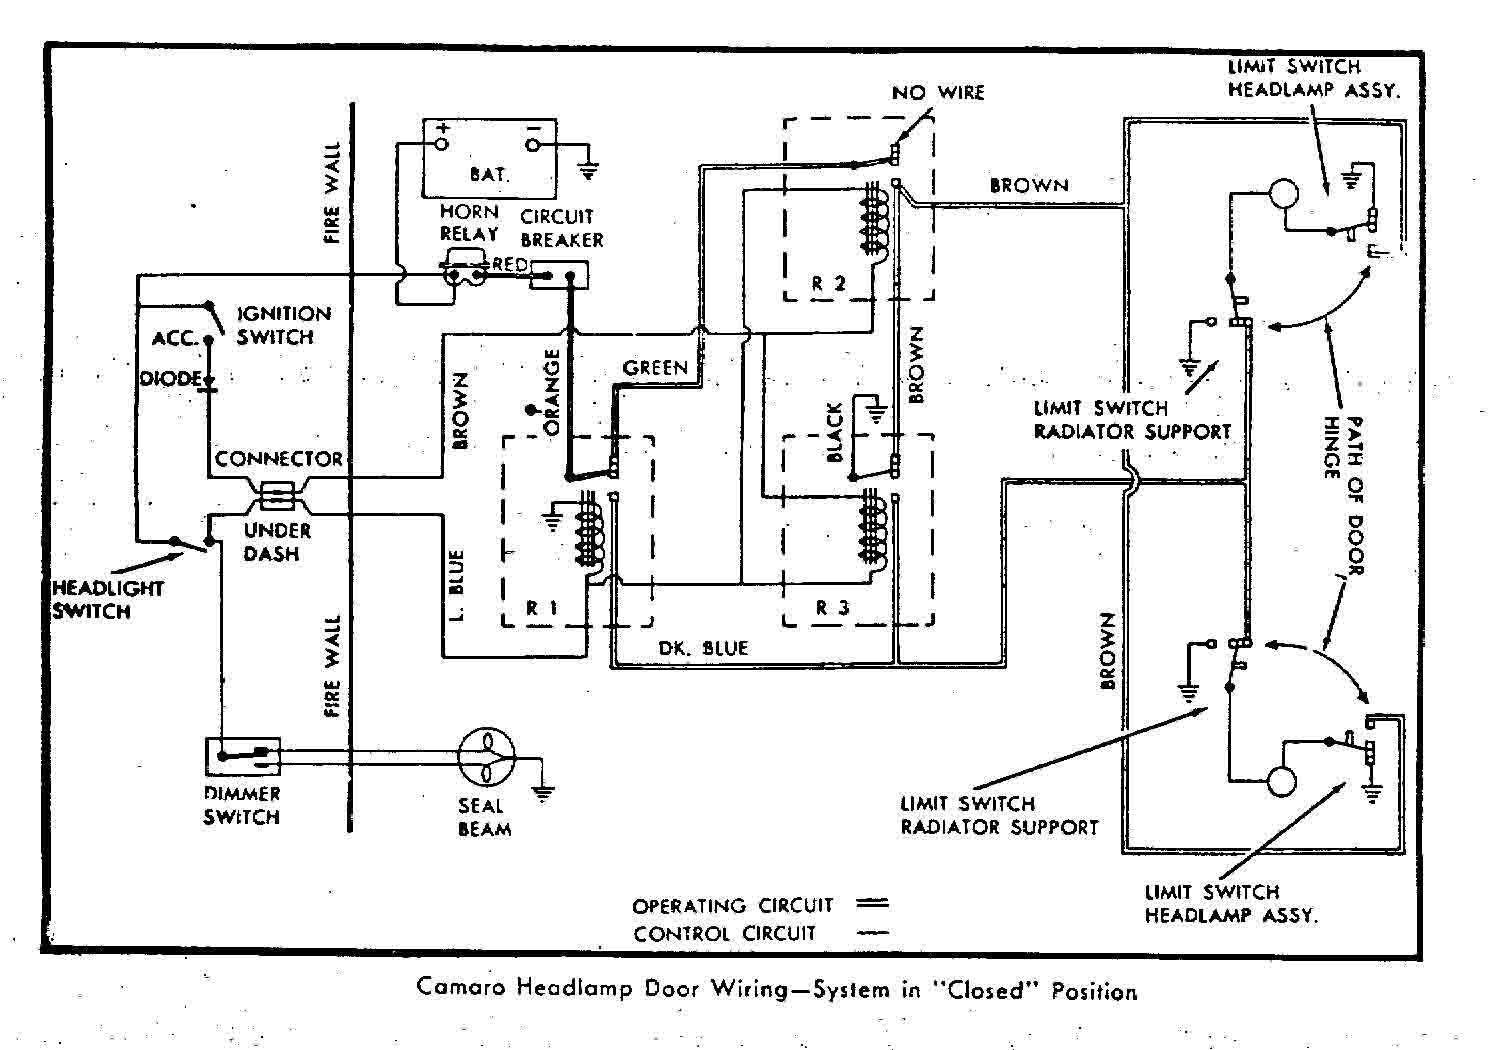 69 camaro wiring diagram furthermore 1967 camaro headlight wiring